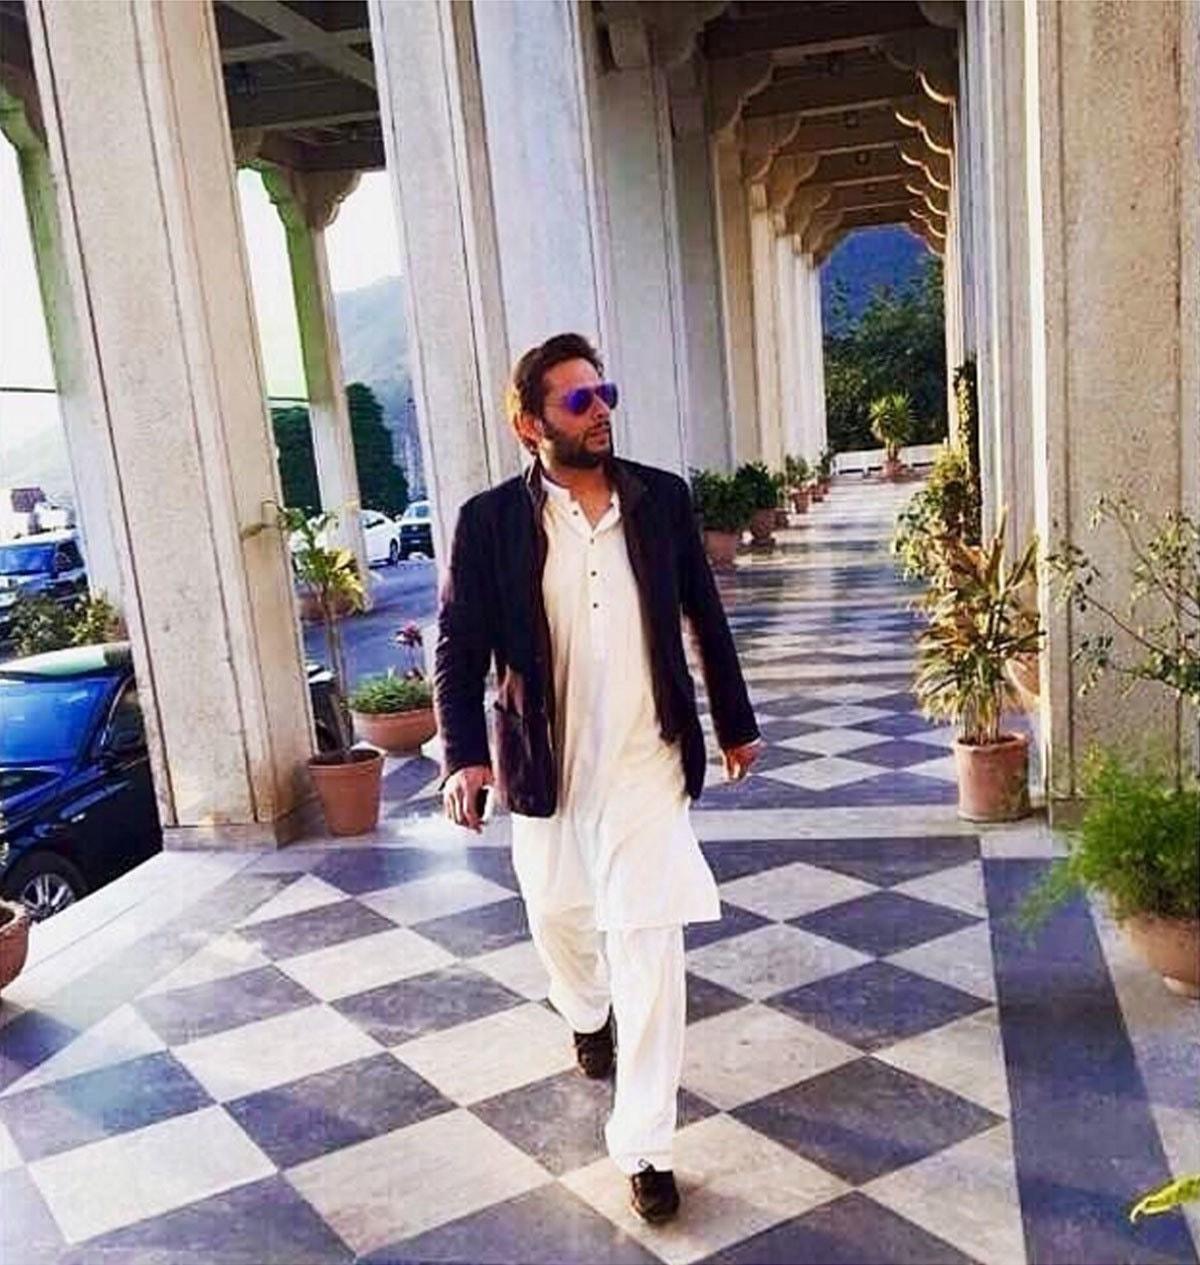 I got 99 problems but rocking a shalwar kameez ain't one. - Instagram